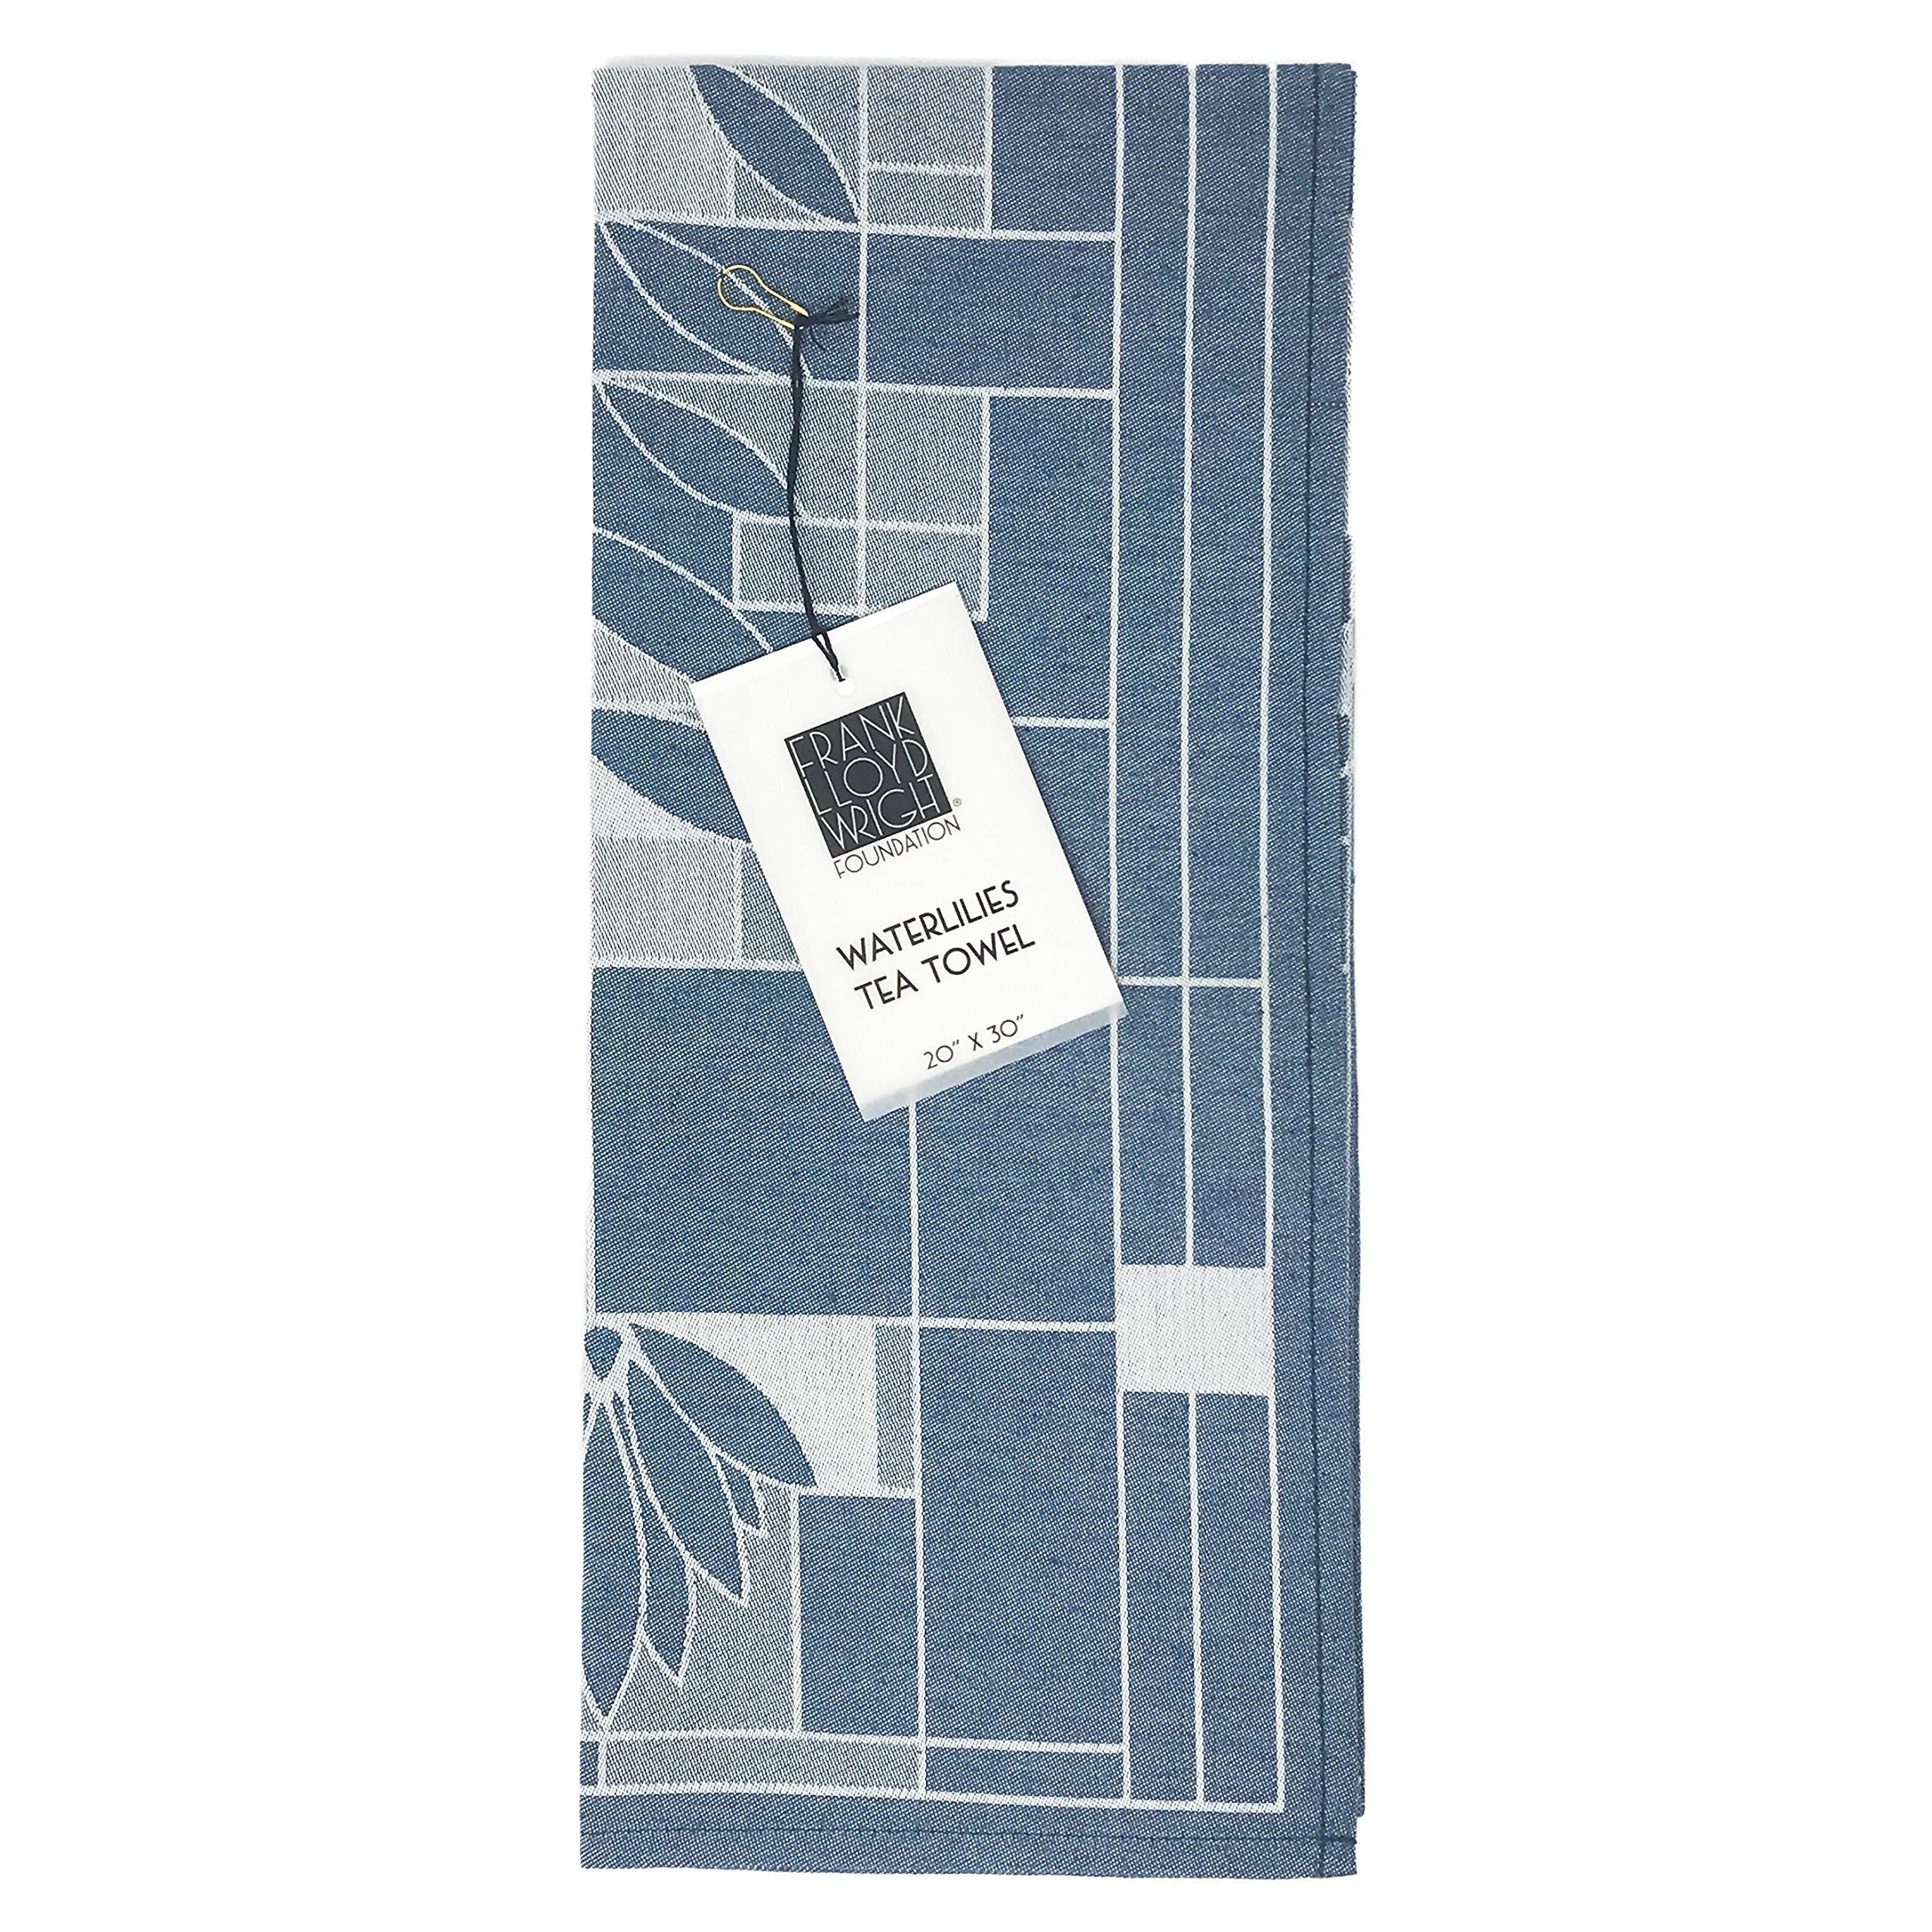 KAF Home Frank Lloyd Wright Woven Jacquard Tea Towel 20 x 30-inch 100-Percent Cotton (Water Lilies)